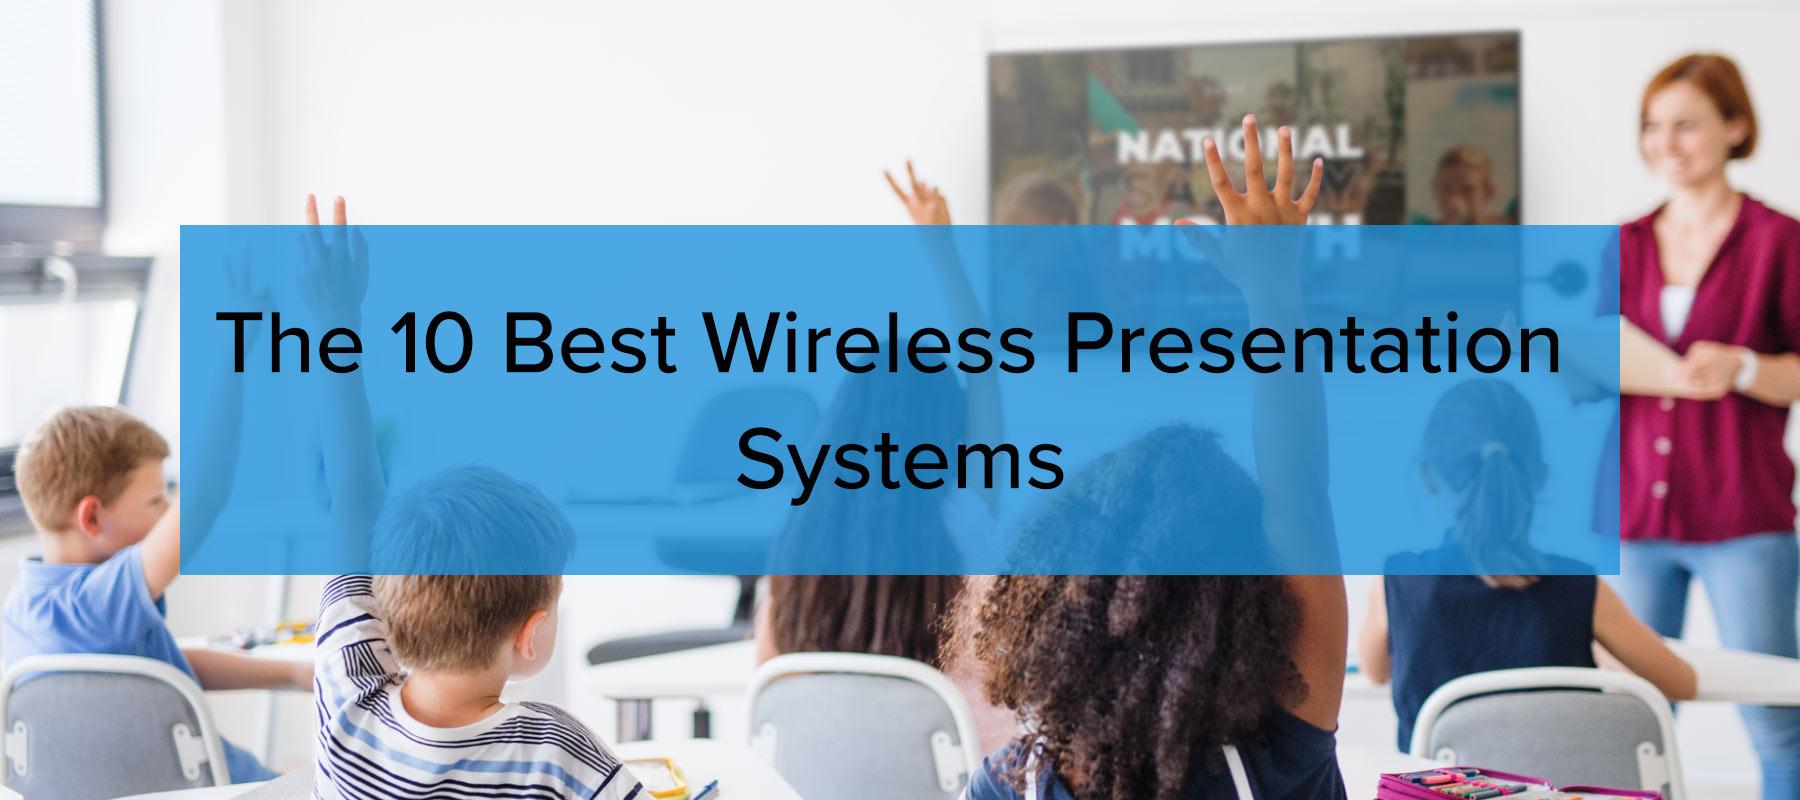 The 10 best wireless presentation systems